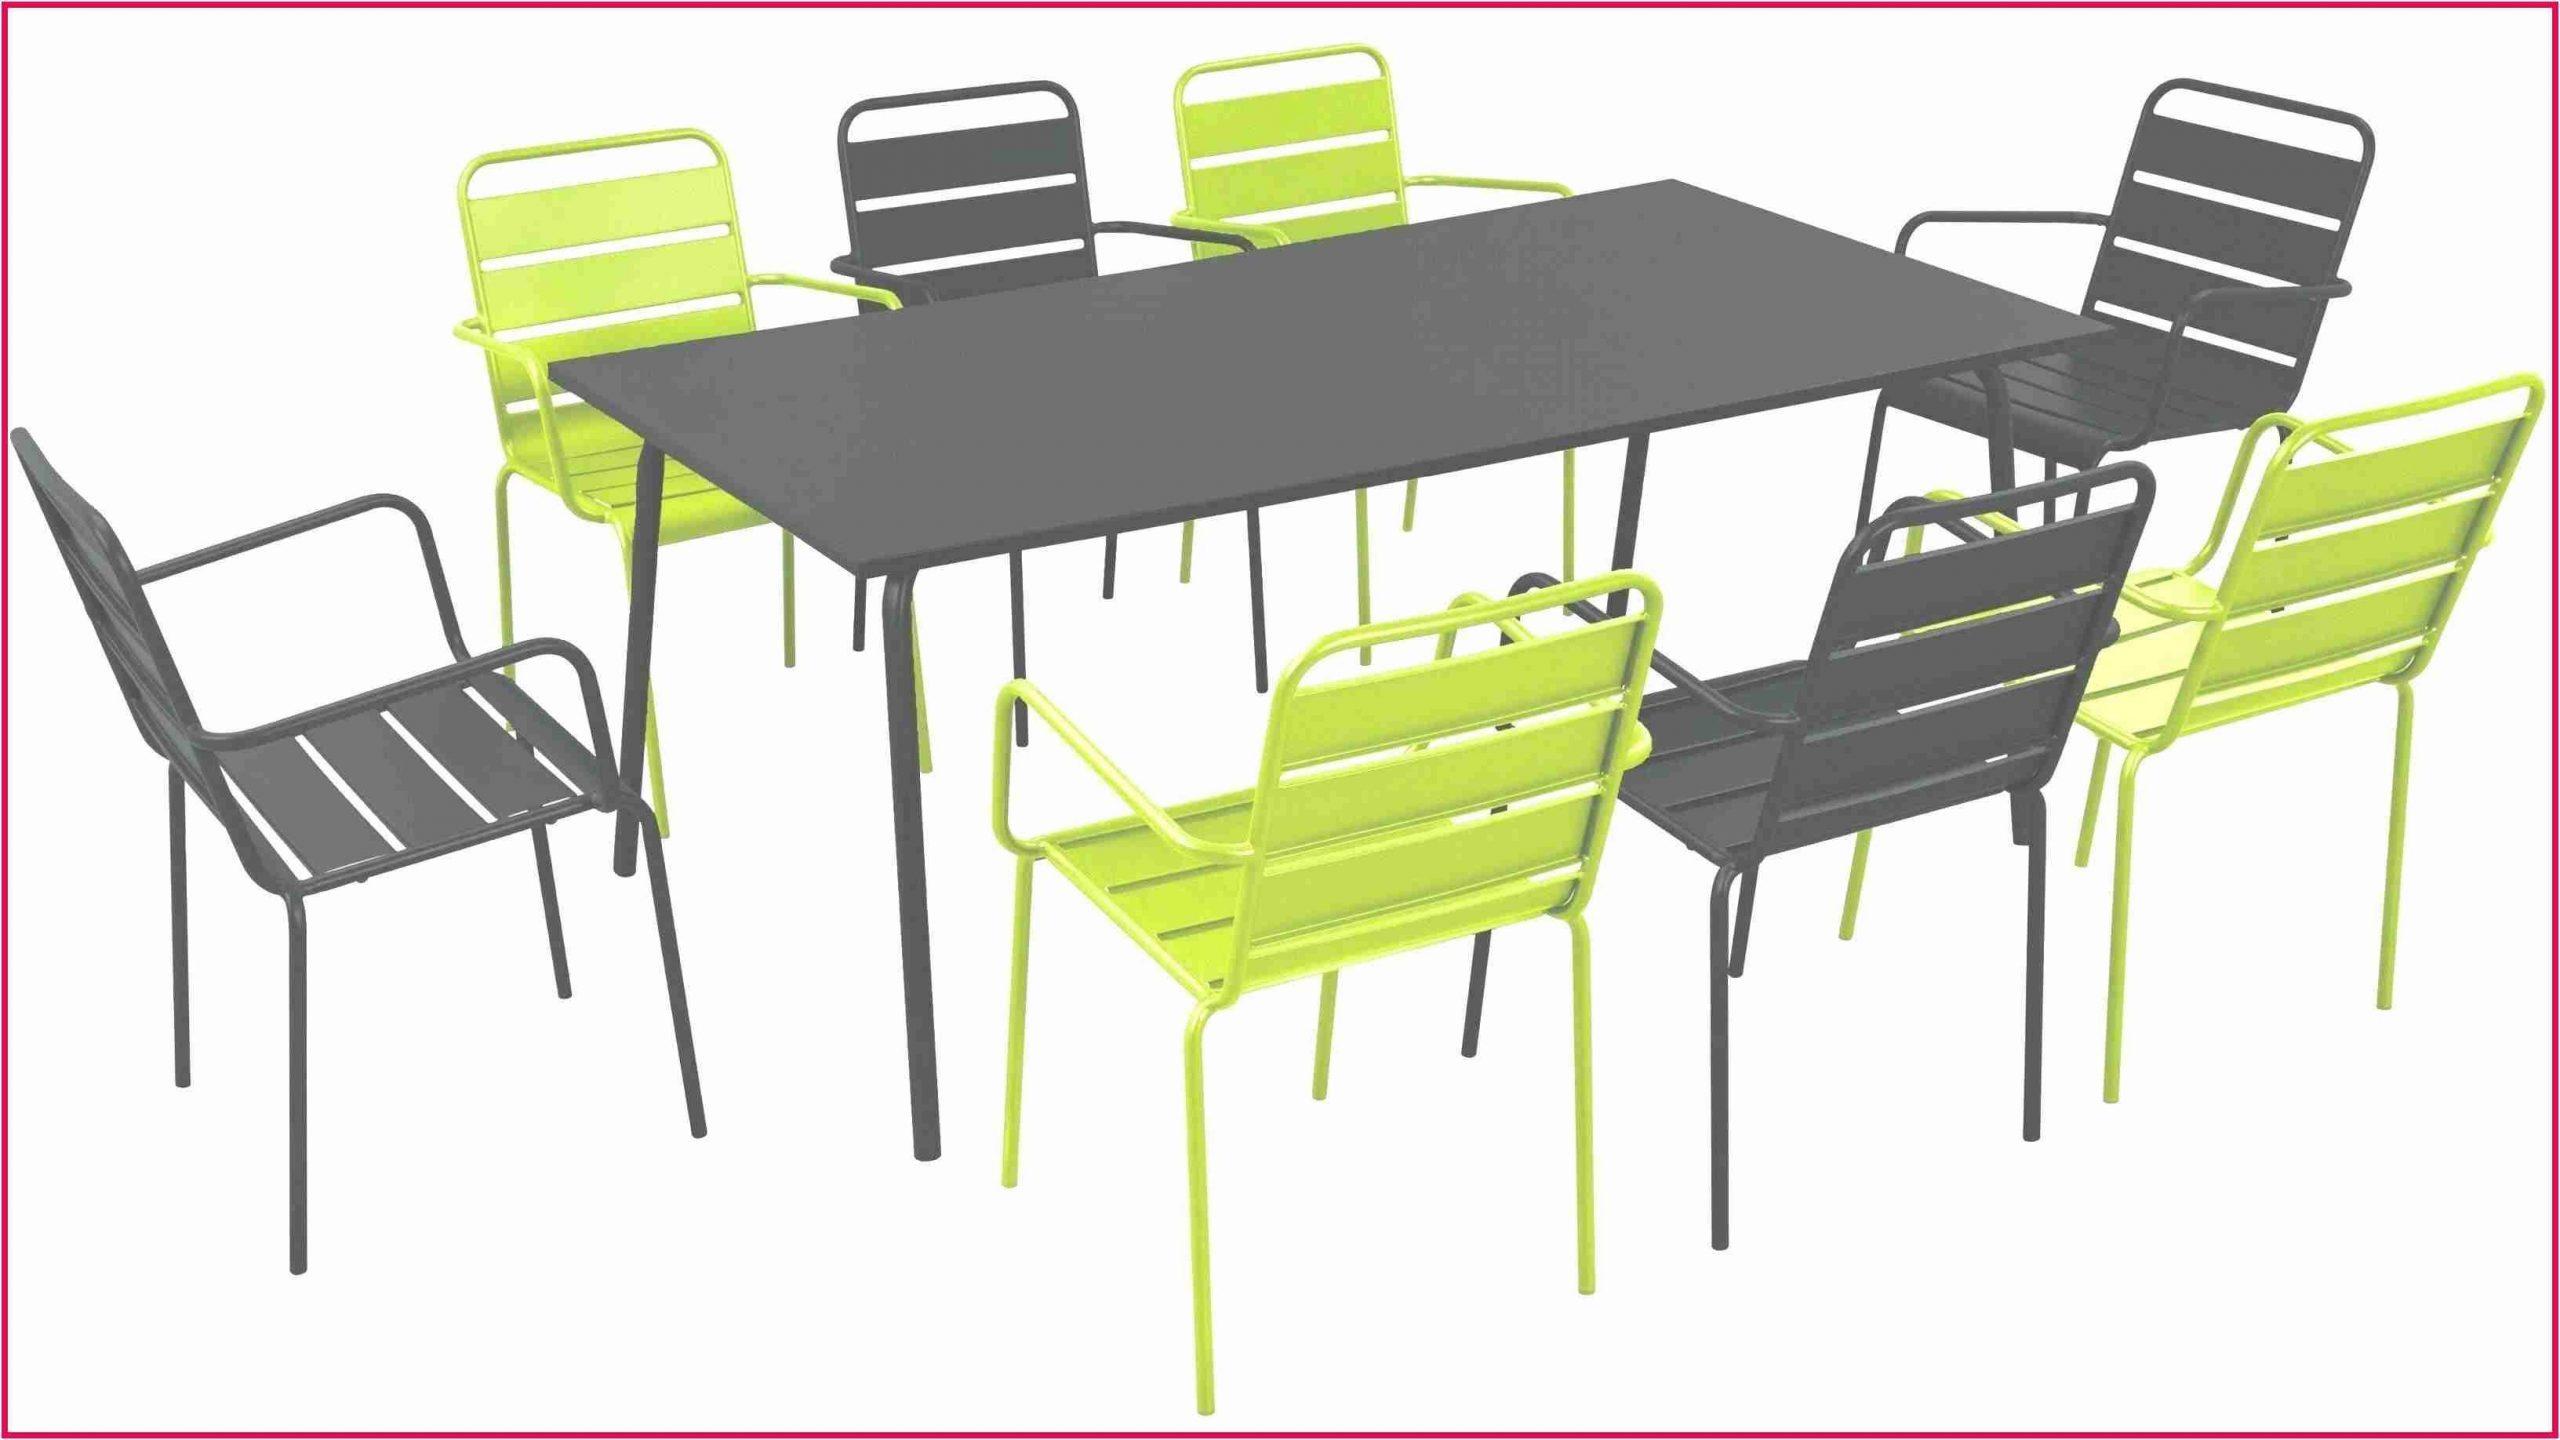 46 Nice Chaise Pliante Gifi tout Ikea Table Pliante Jardin